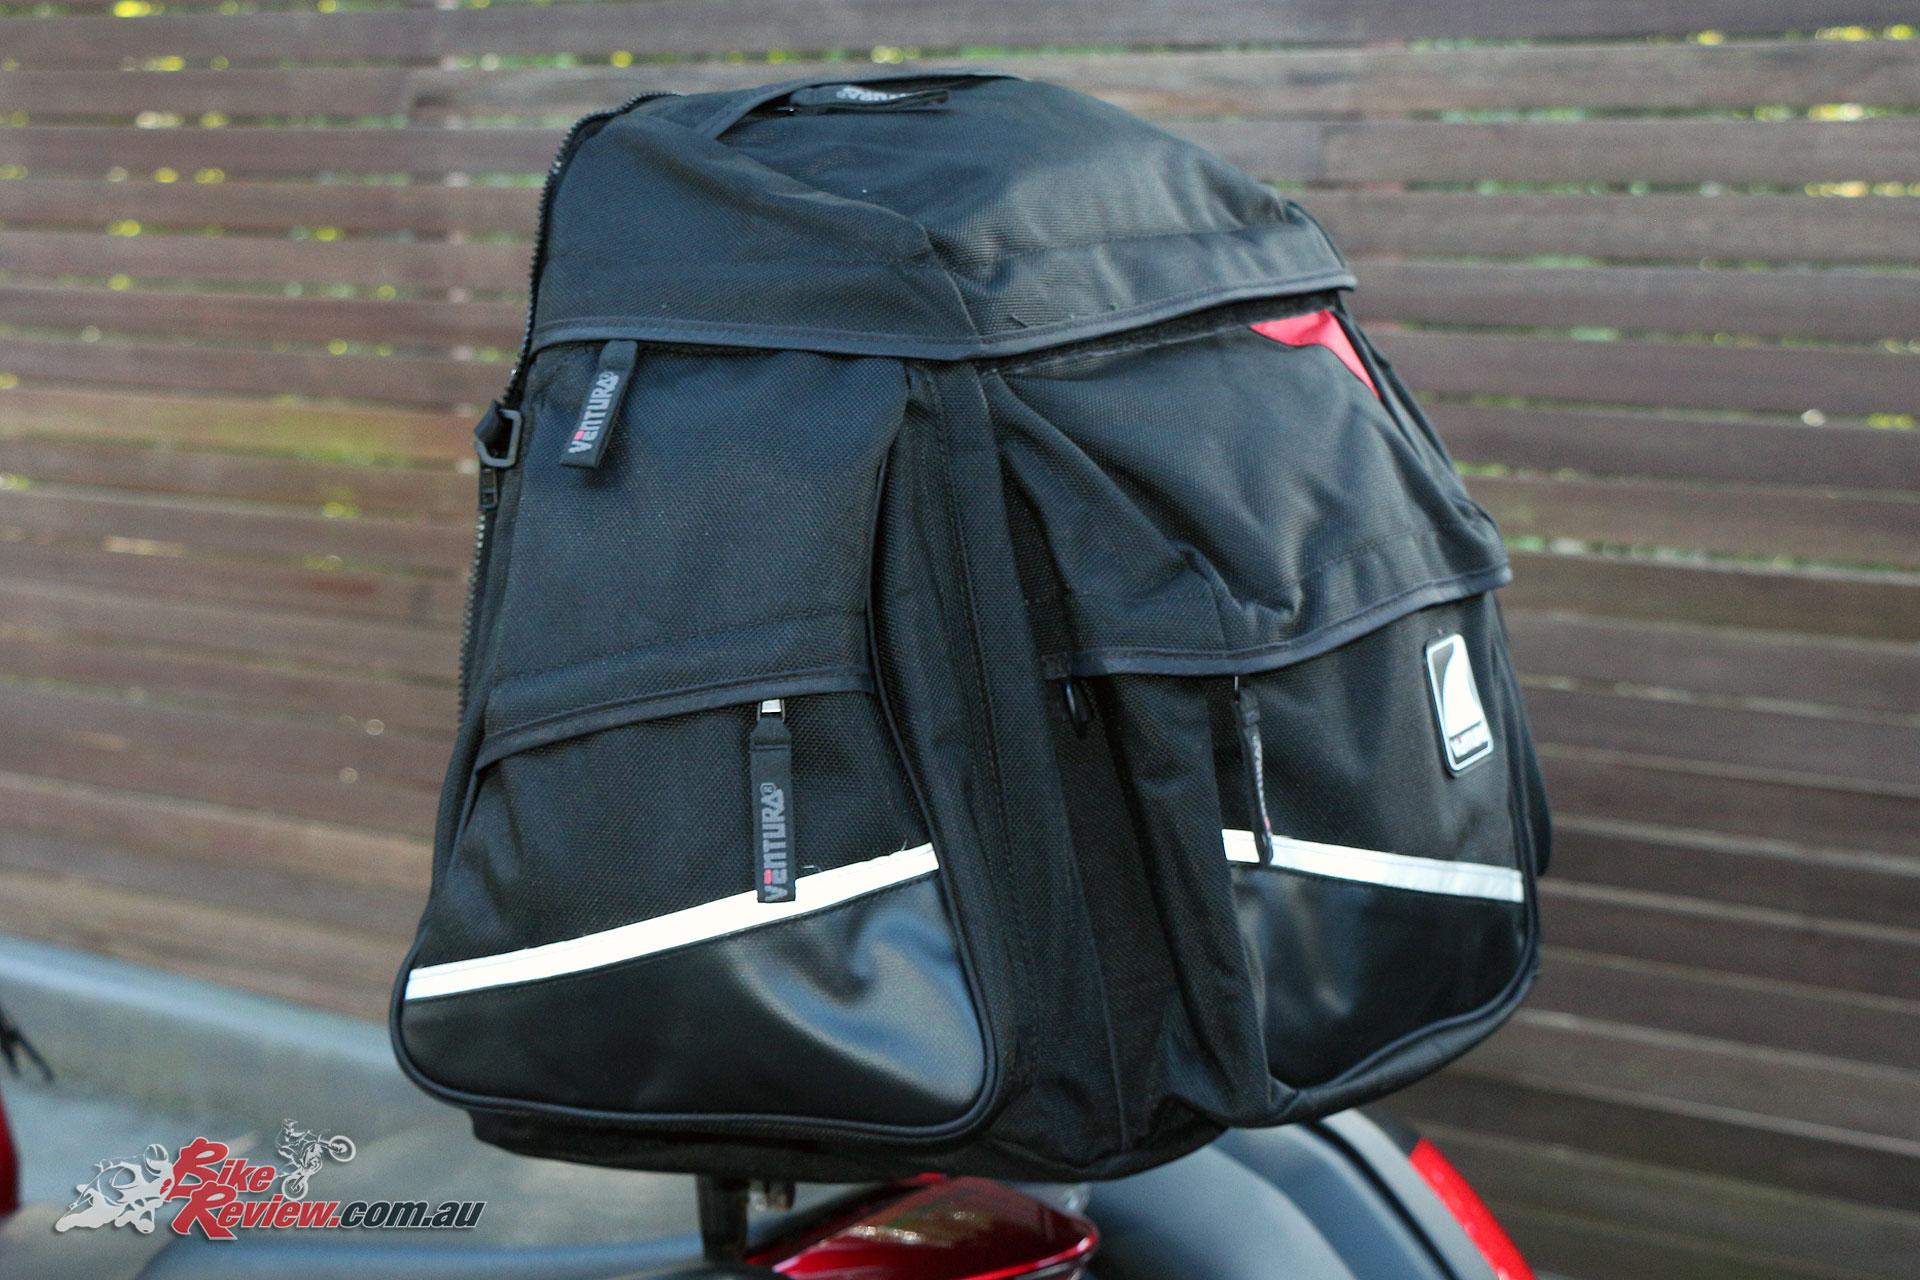 The Ventura Aero-Spada bag